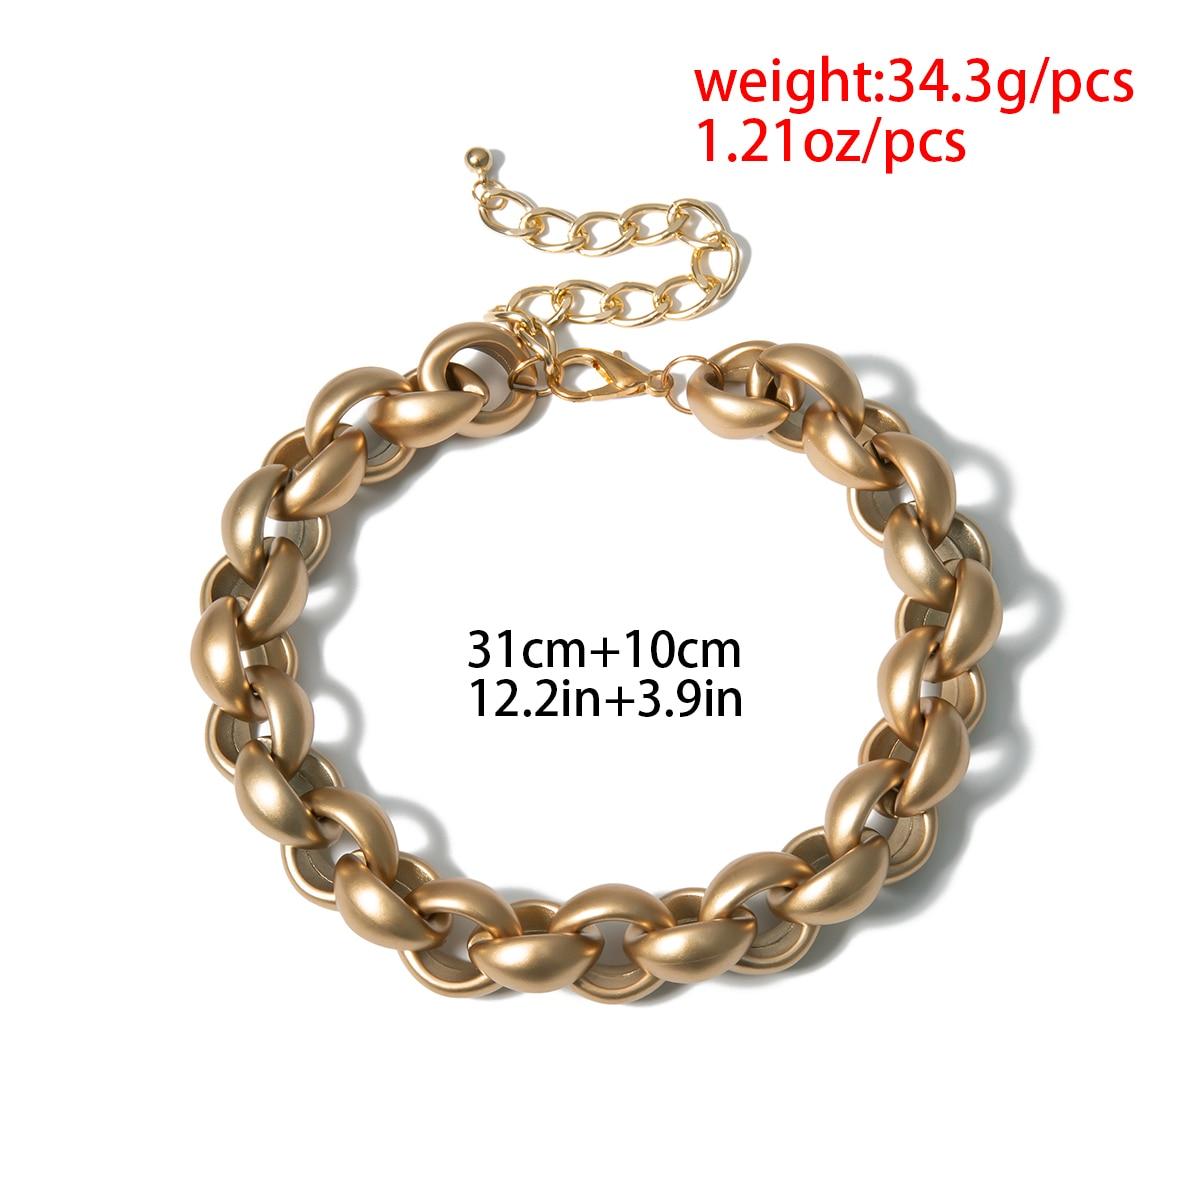 Купить с кэшбэком Exaggerated Vintage Ancient Choker Necklace Pendant Women Statement Lock Link Thick Chain Necklace Steampunk Men Jewelry